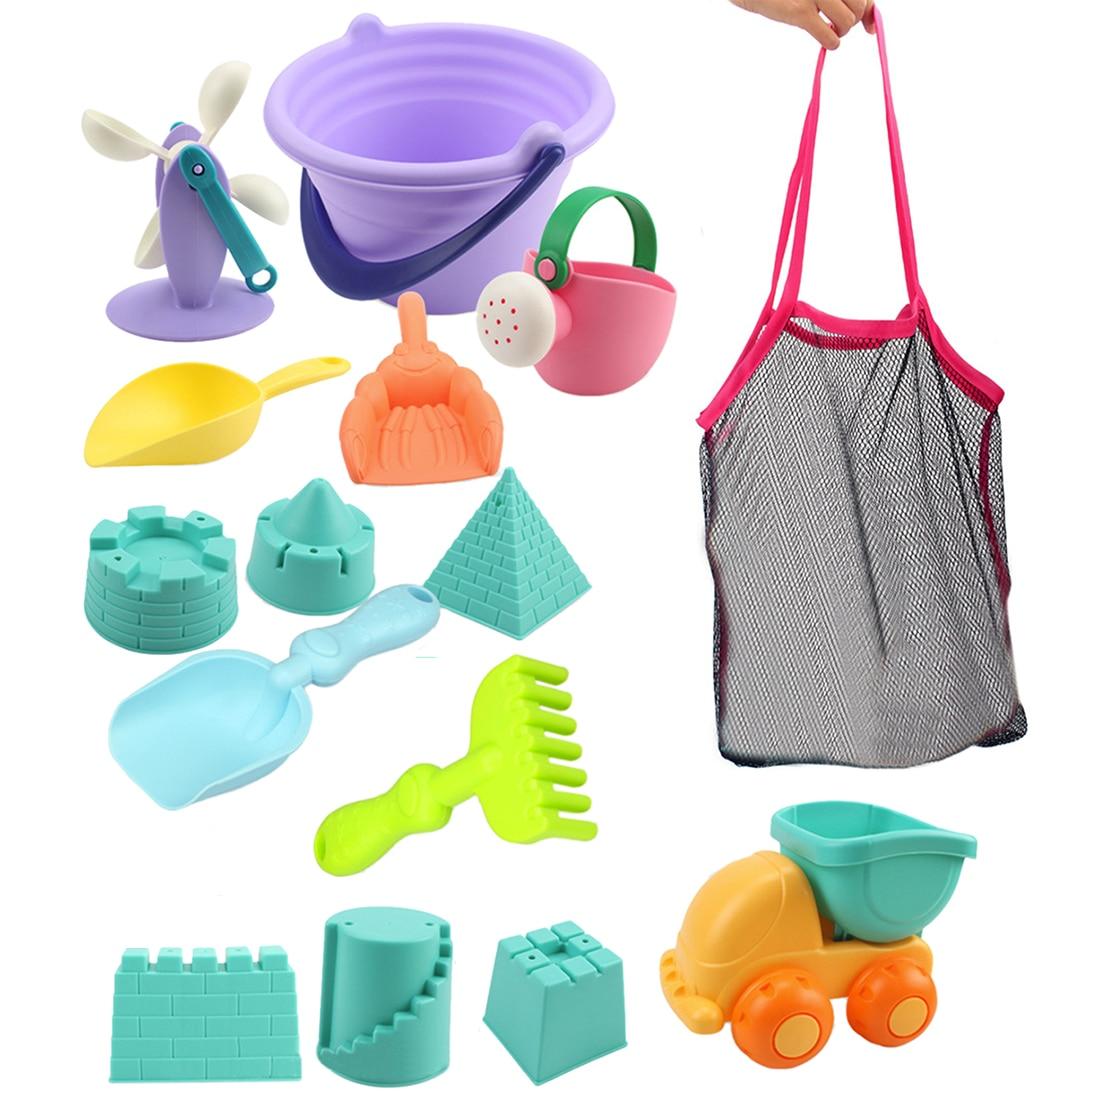 Hot 15Pcs set Beach Sand Toys Soft Rubber Beach Bucket Playset Fun Toys Gift for Kids